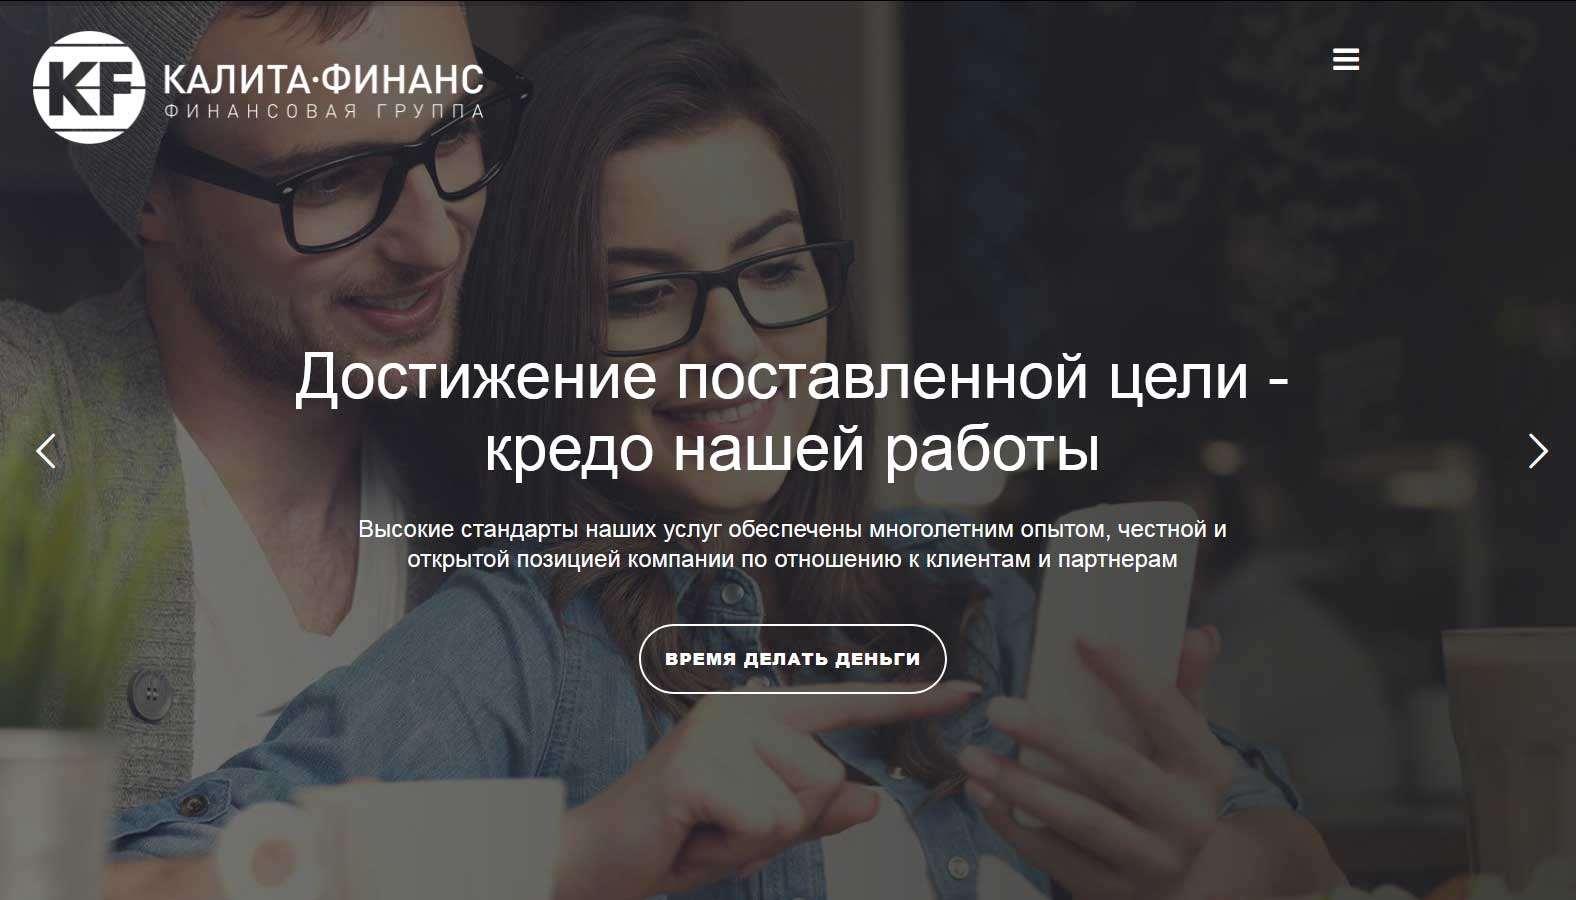 Калита-Финанс брокер: обзор